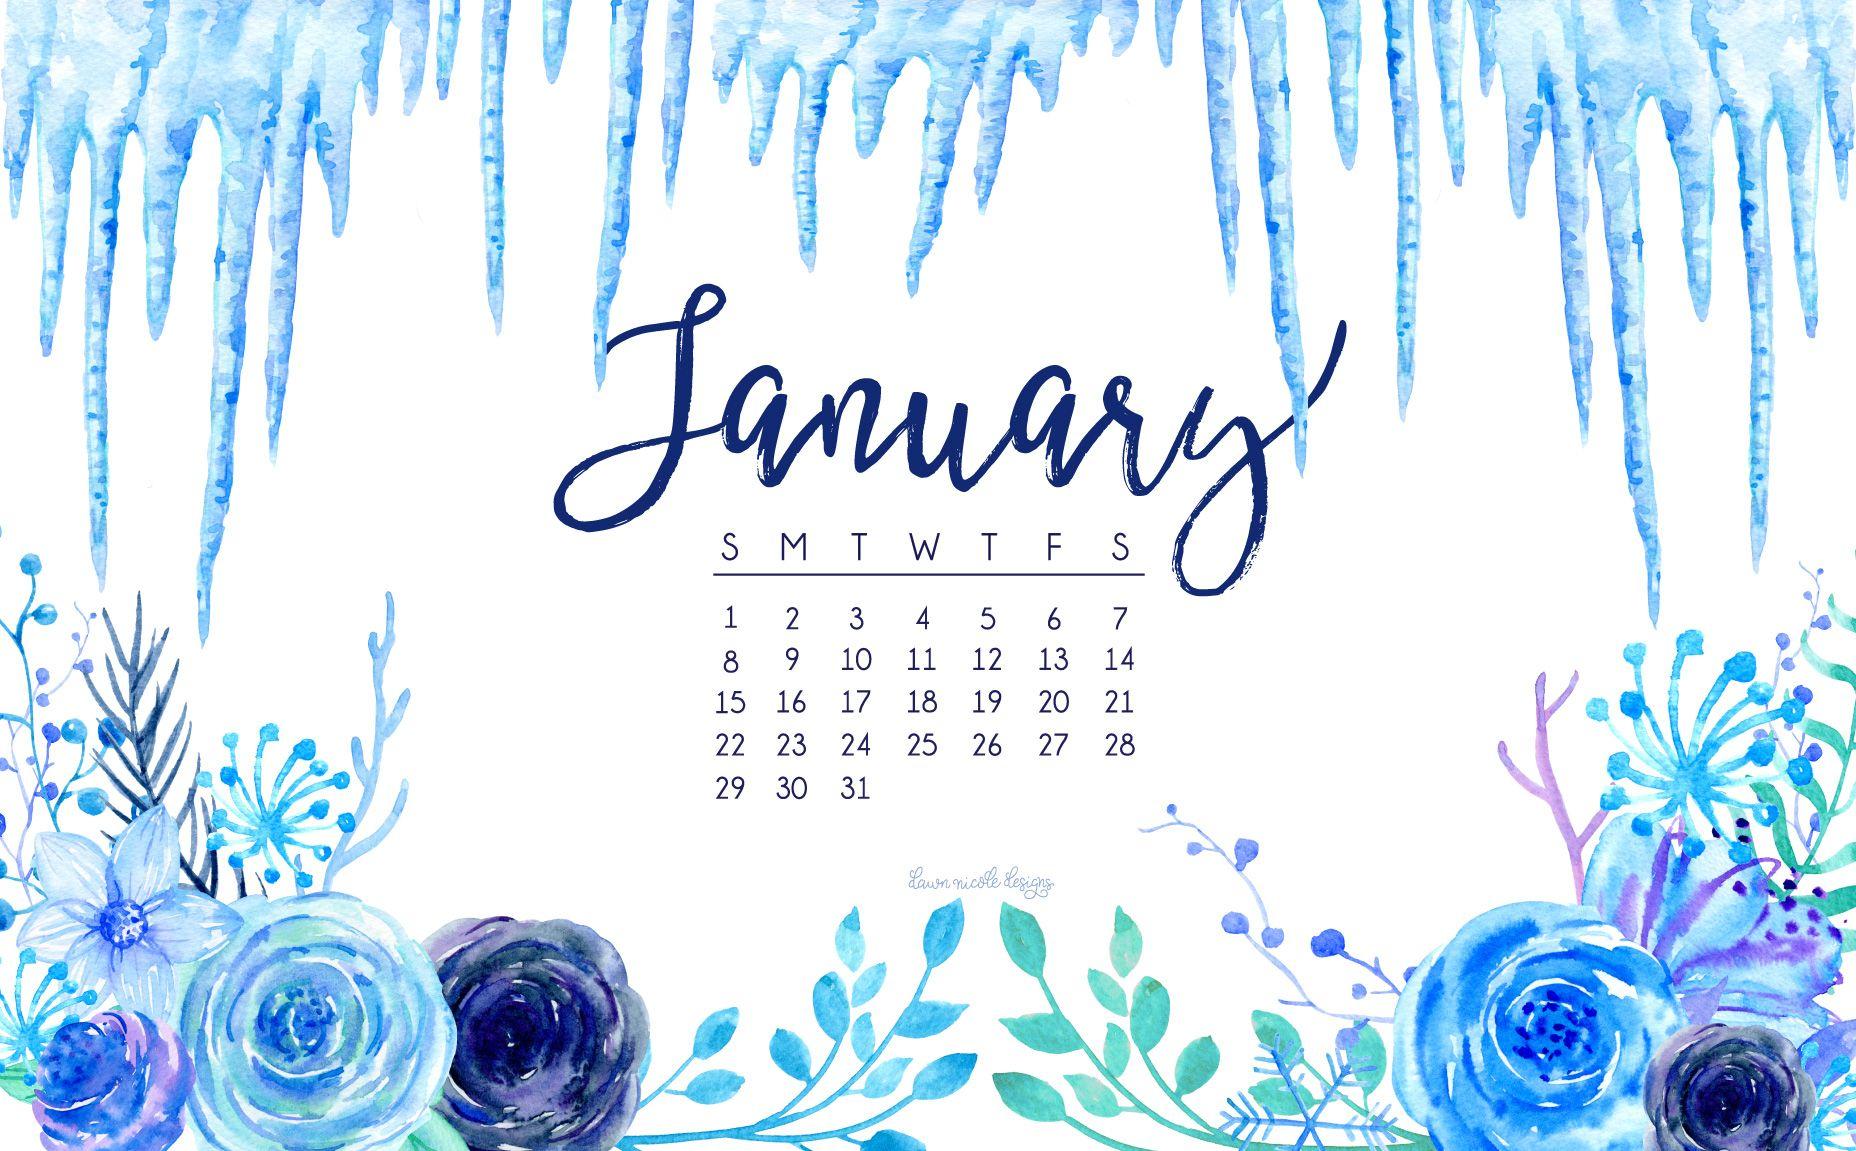 January2017WallpaperDND.jpg 1 856 × 1 151 bildepunkter